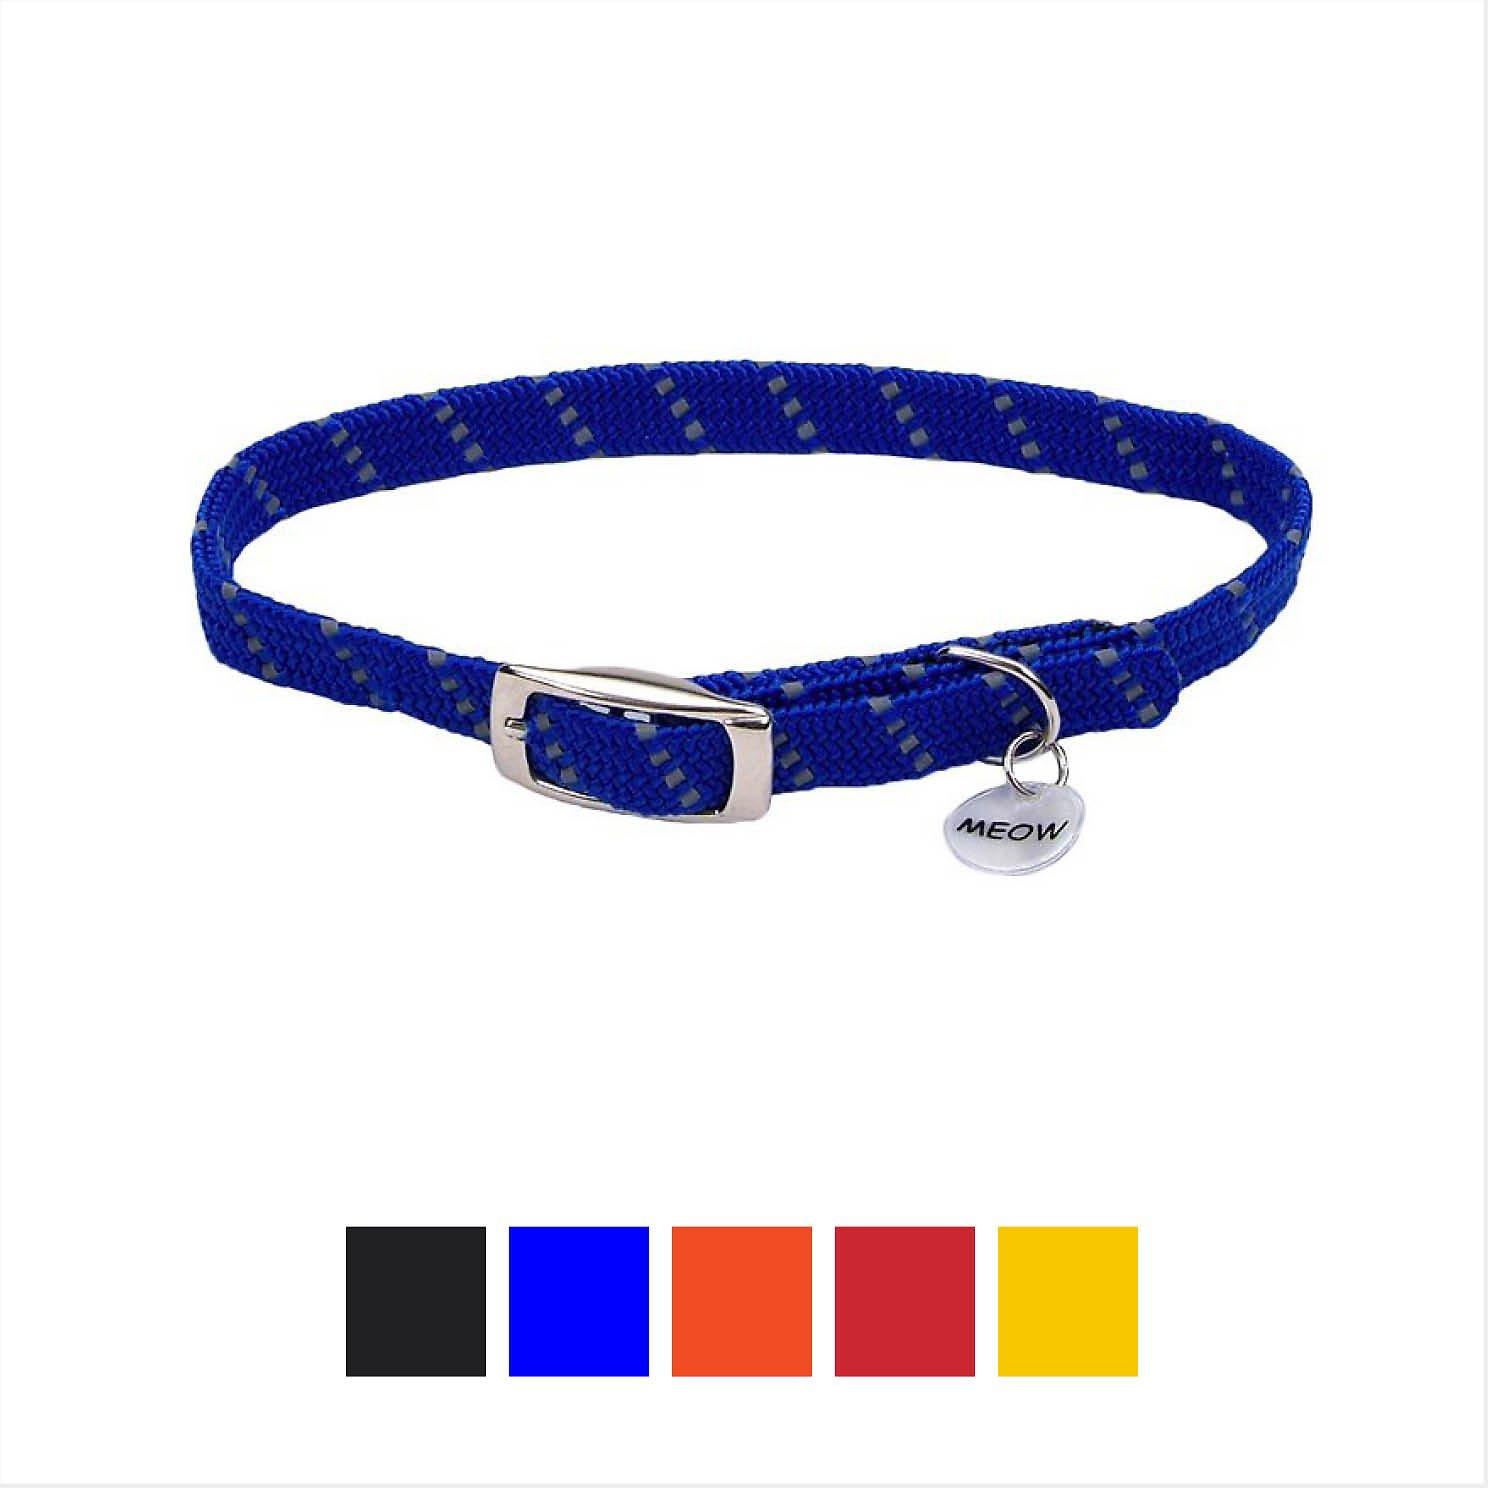 ElastaCat Reflective Safety Stretch Cat Collar, Blue, 10-in